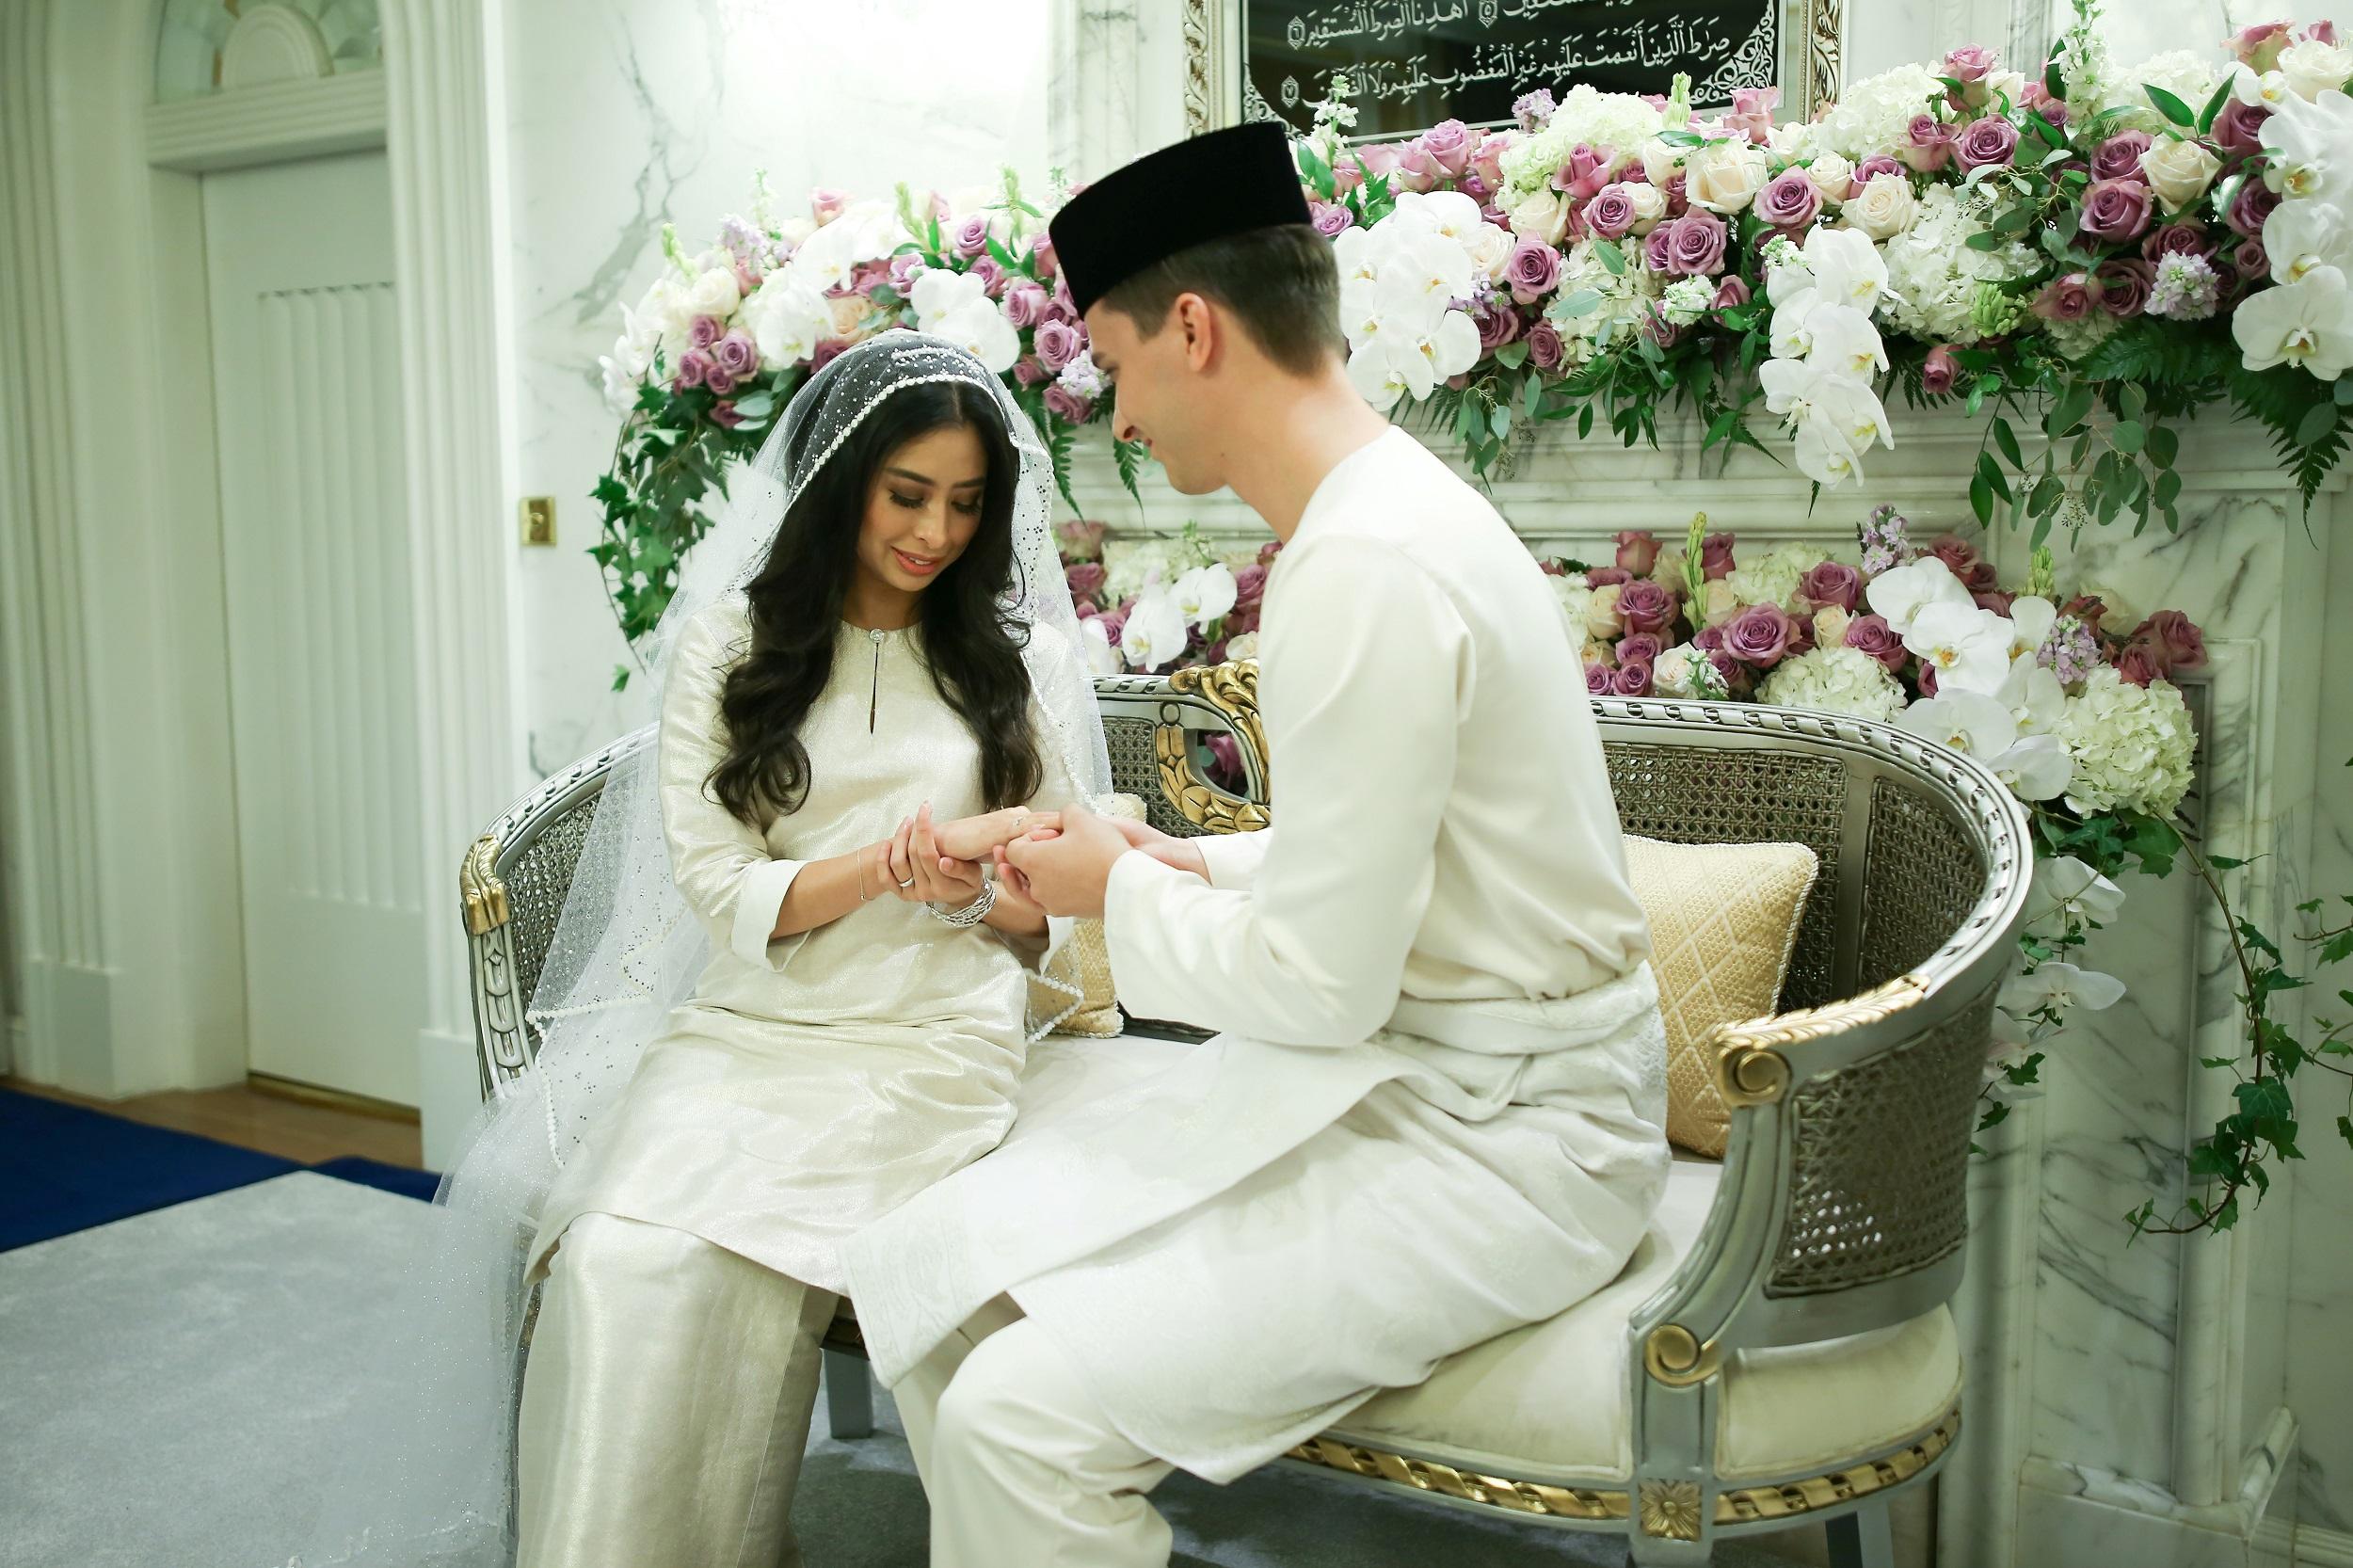 life/malaysian-princess-marries-dutchman-in-lavish-ceremony